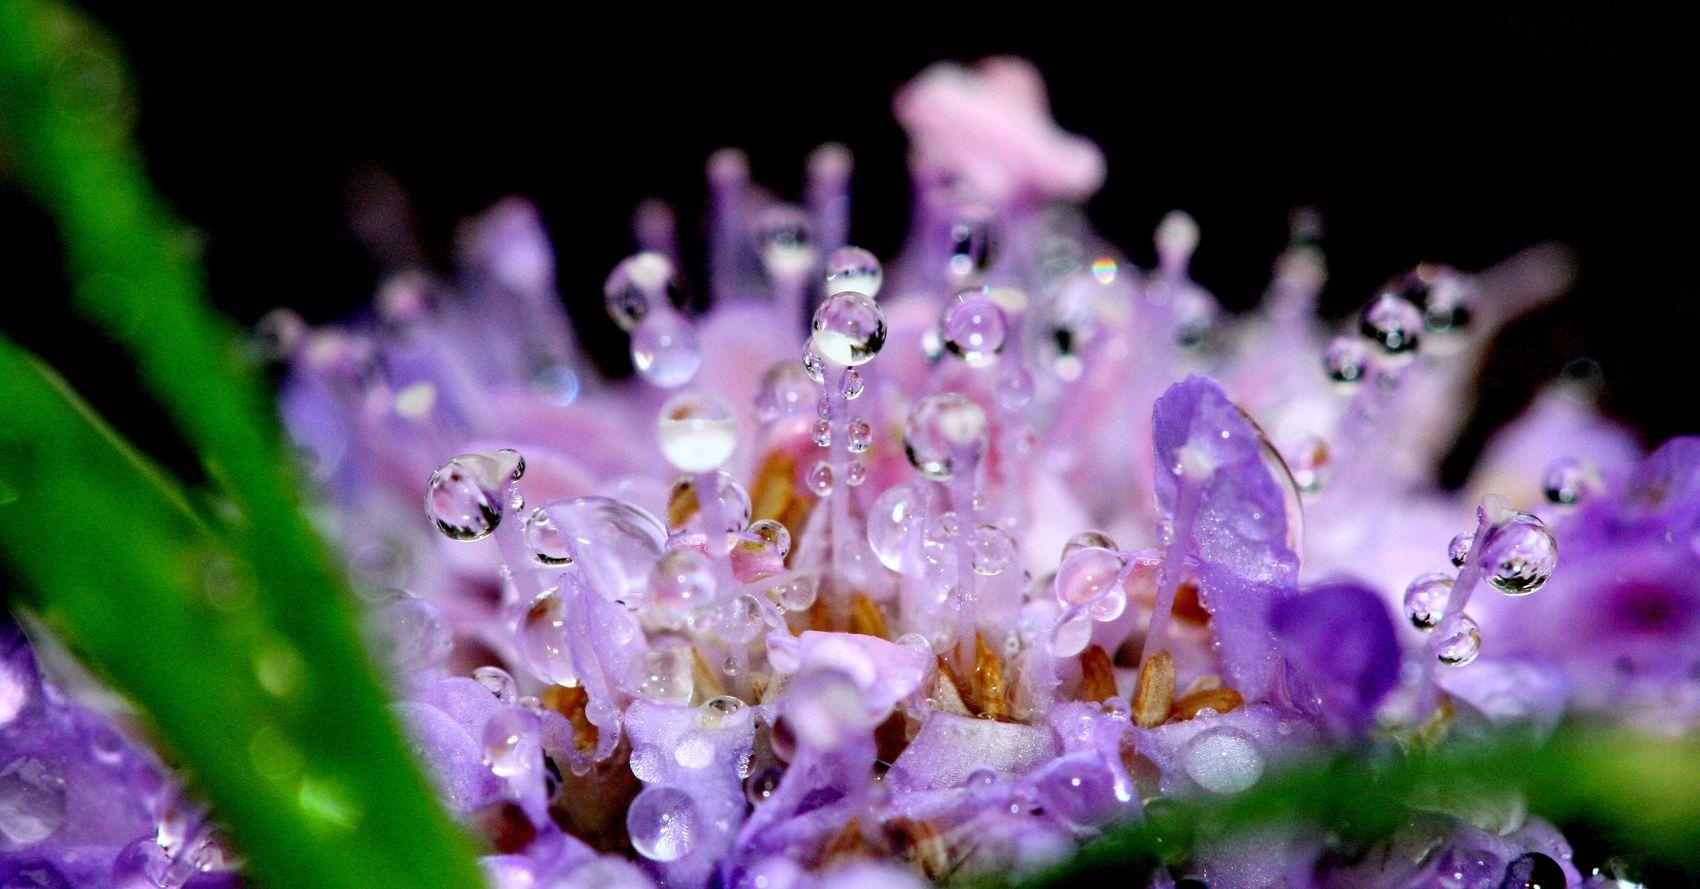 water drops on flowers